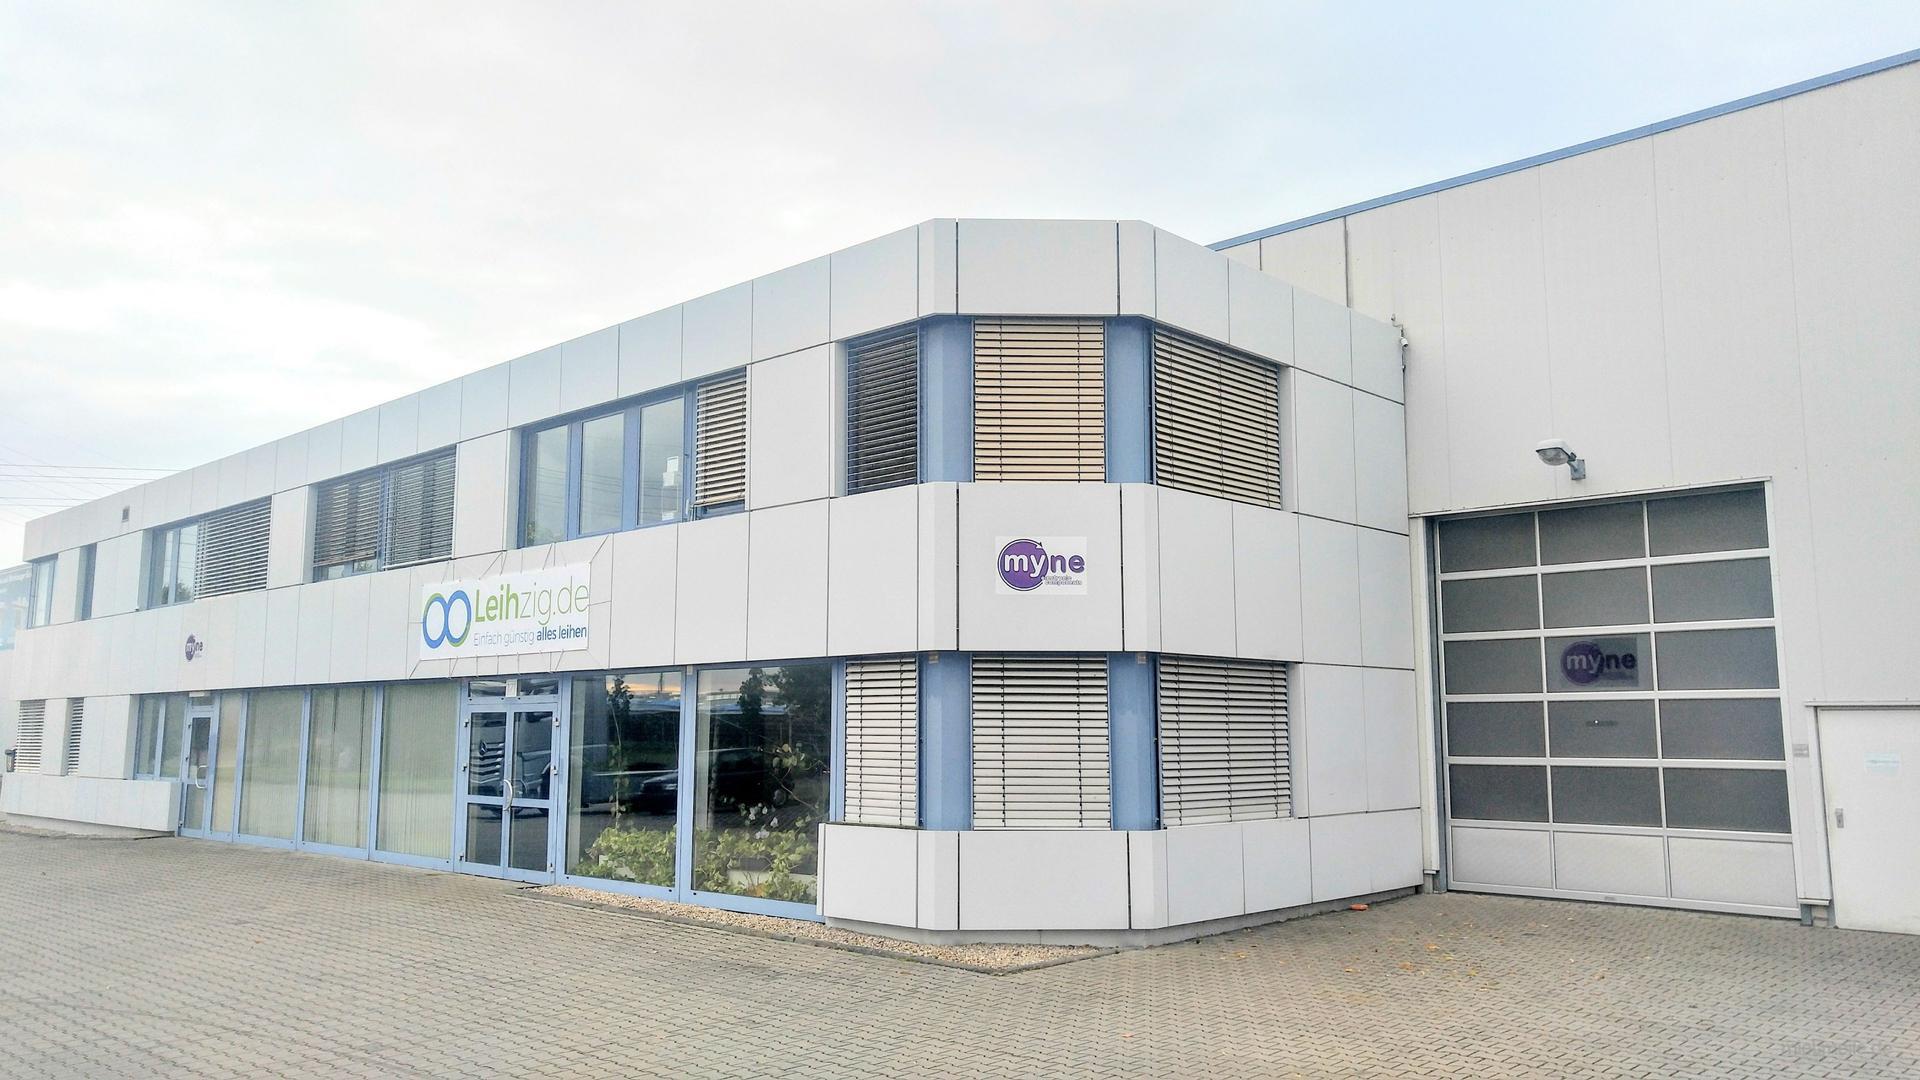 Bohrmaschine mieten & vermieten - Schlag-Bohrmaschine Meisselhammer Makita HR2450 in Schkeuditz